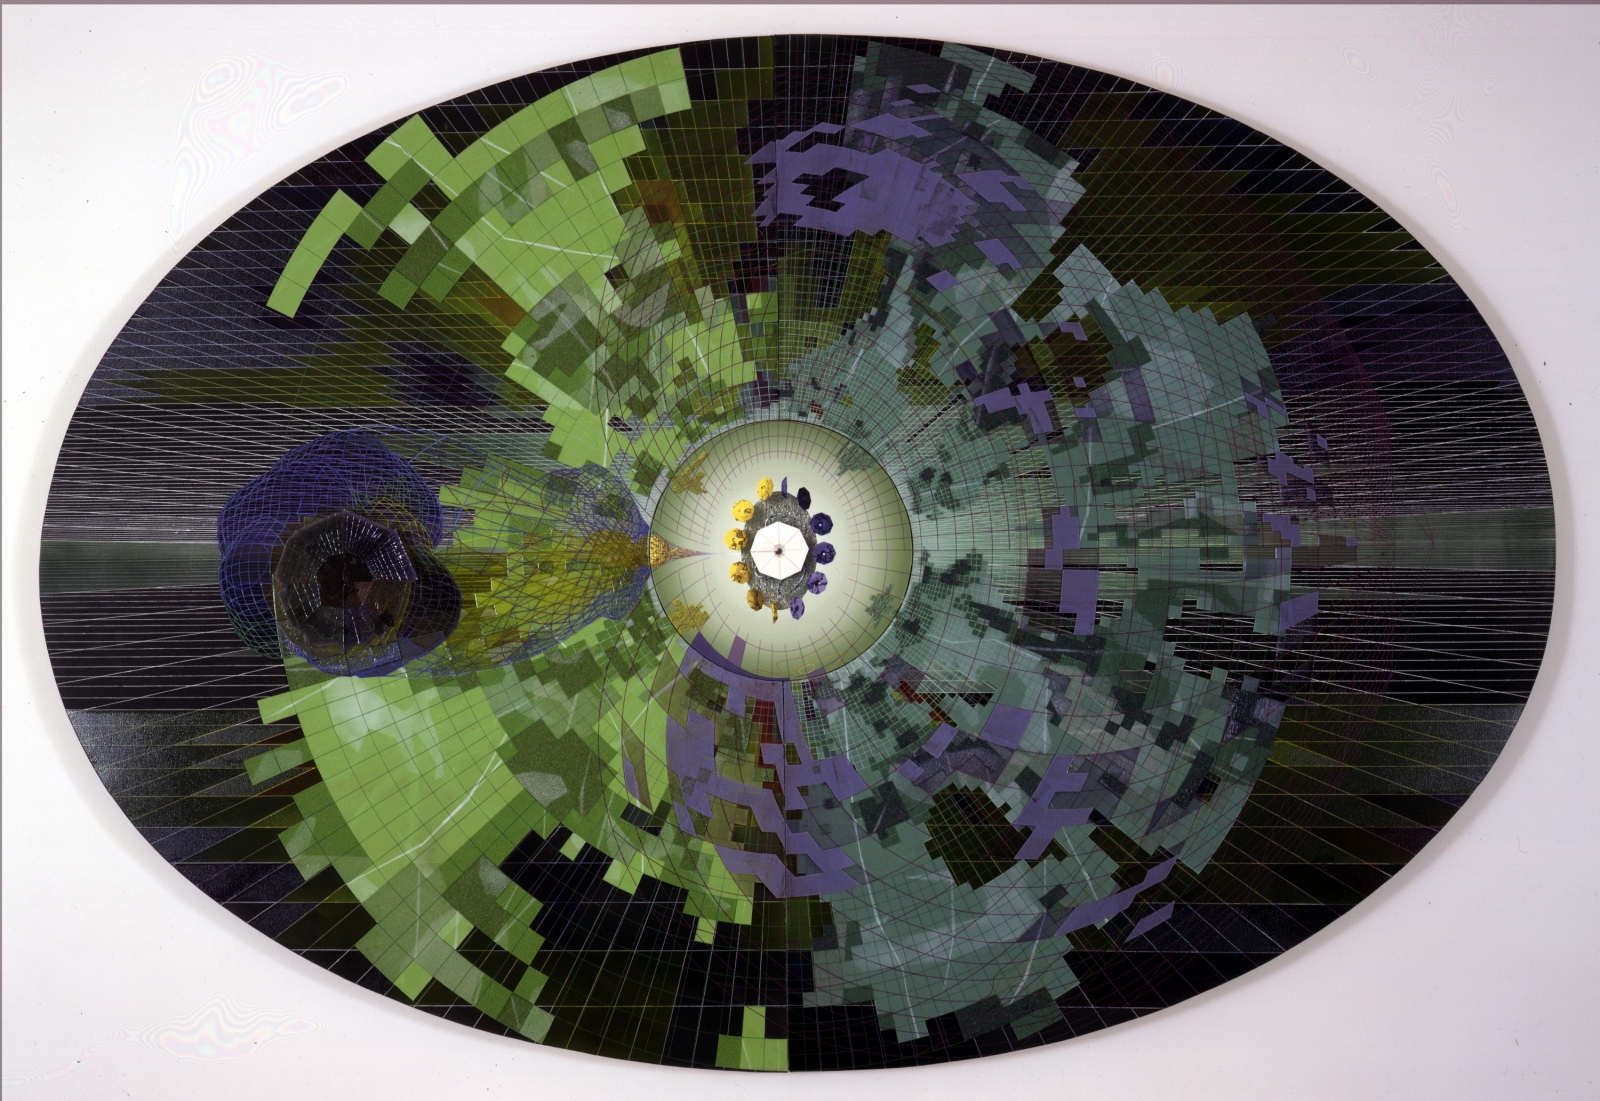 PEDRO BARBEITO, Dark Matter, A Non-Baryonic Structure, 1999